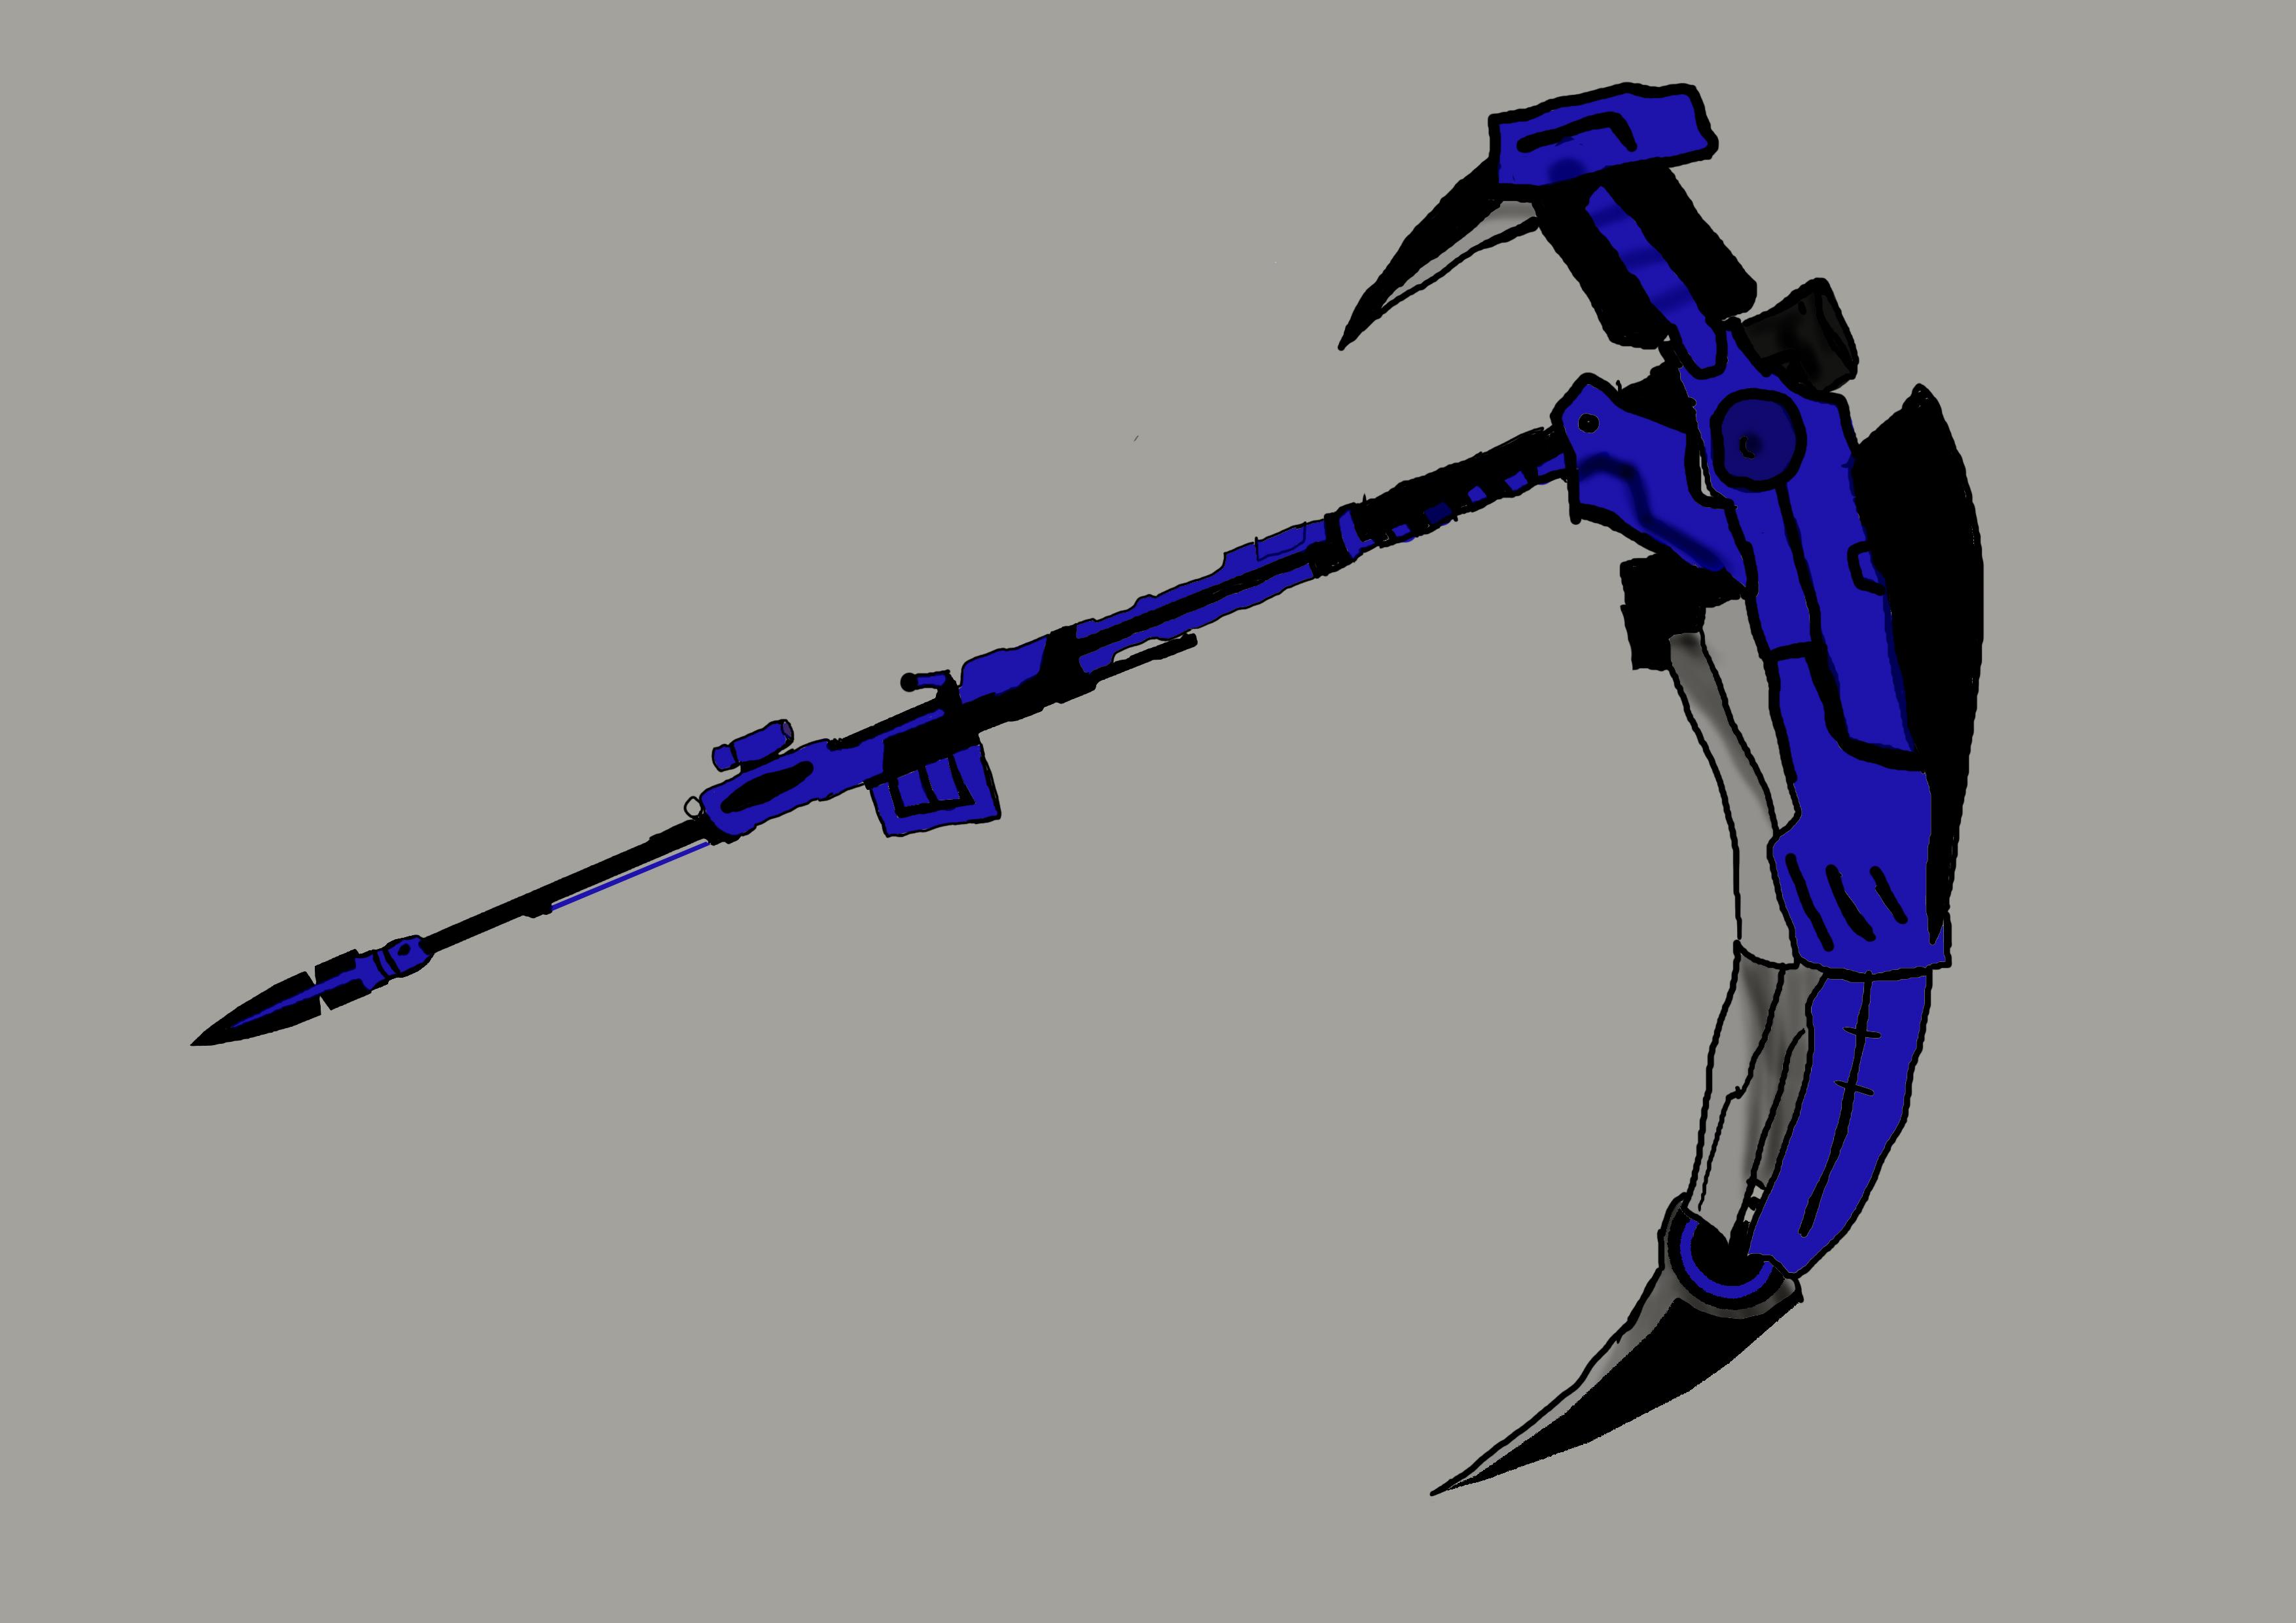 Drawn scythe Drawn jfj2121 DeviantArt by by